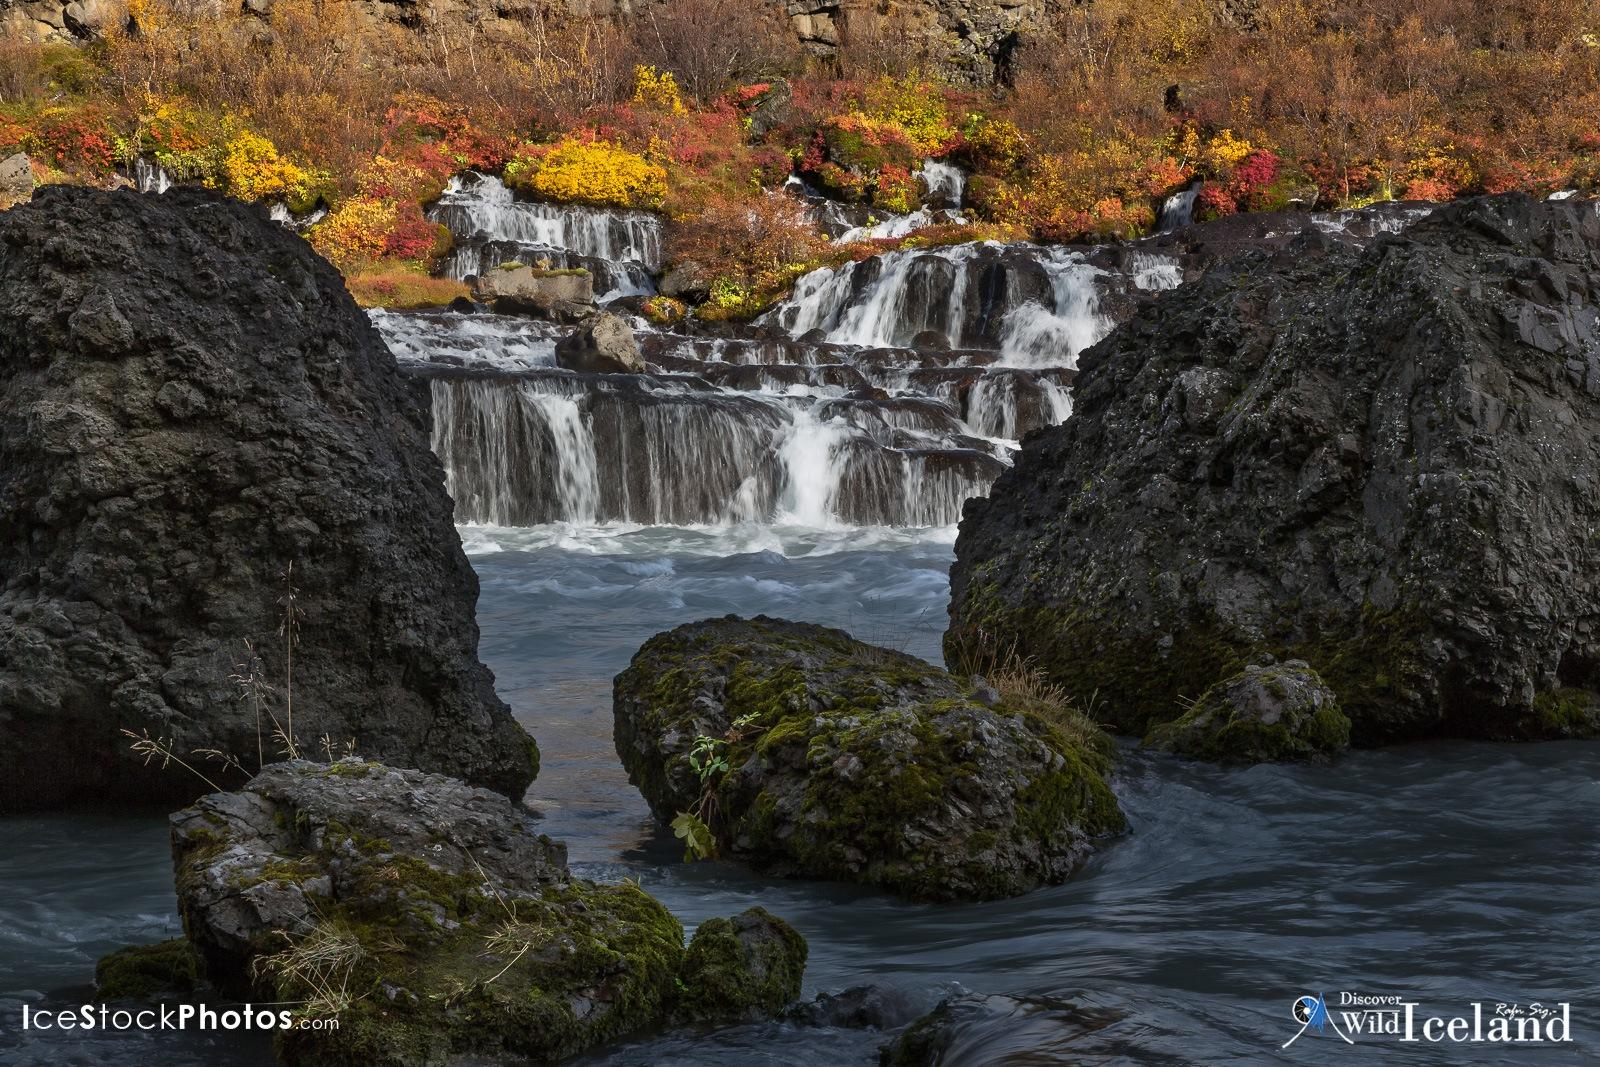 - Hraunfossar. The Colors of Autumn by Rafn Sig,-  @ Discover Wild Iceland.com